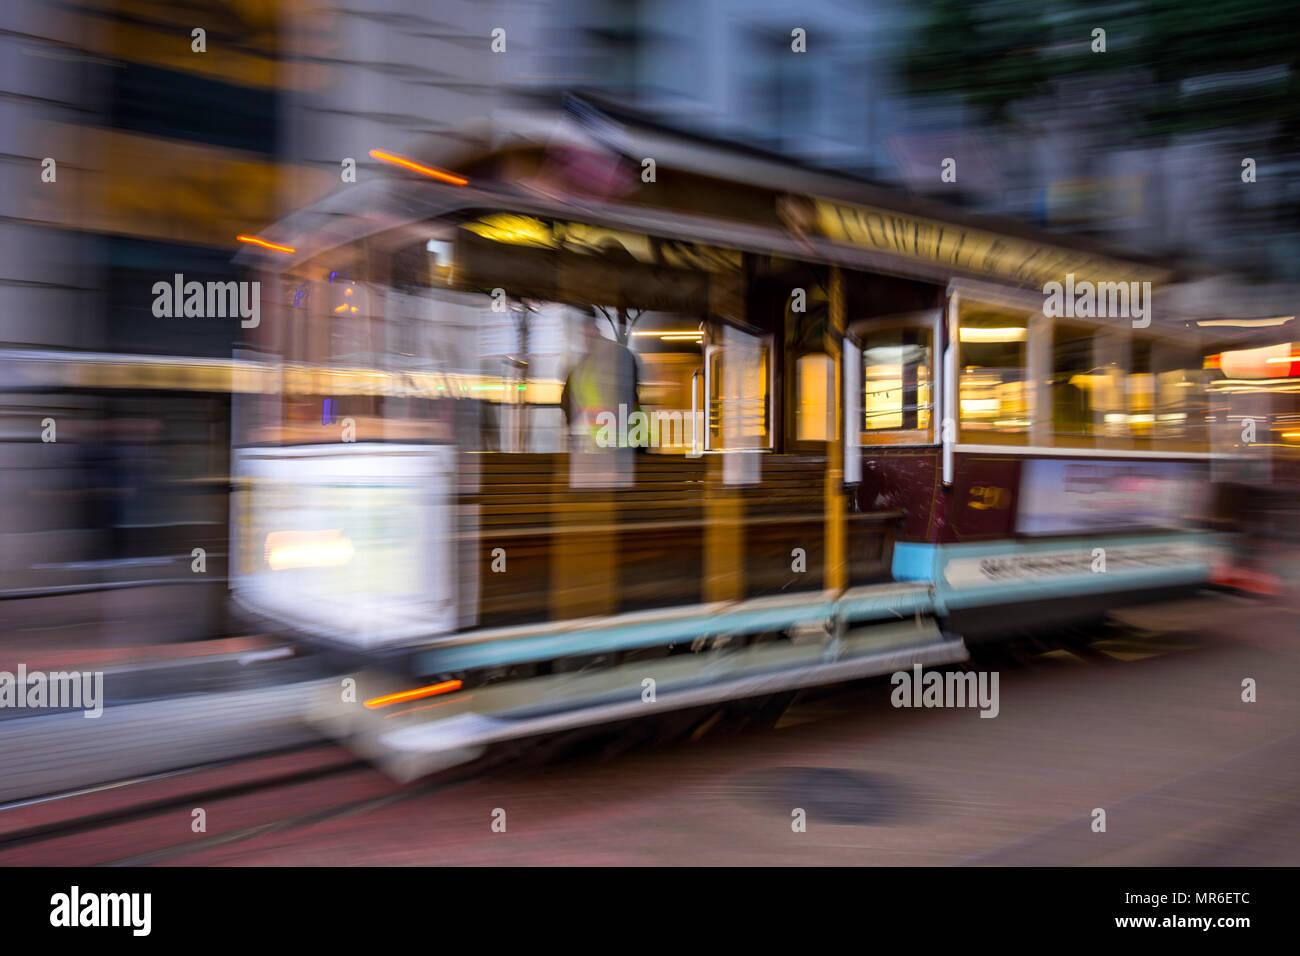 Powell-Mason cable car, San Francisco, CA? USA. - Stock Image